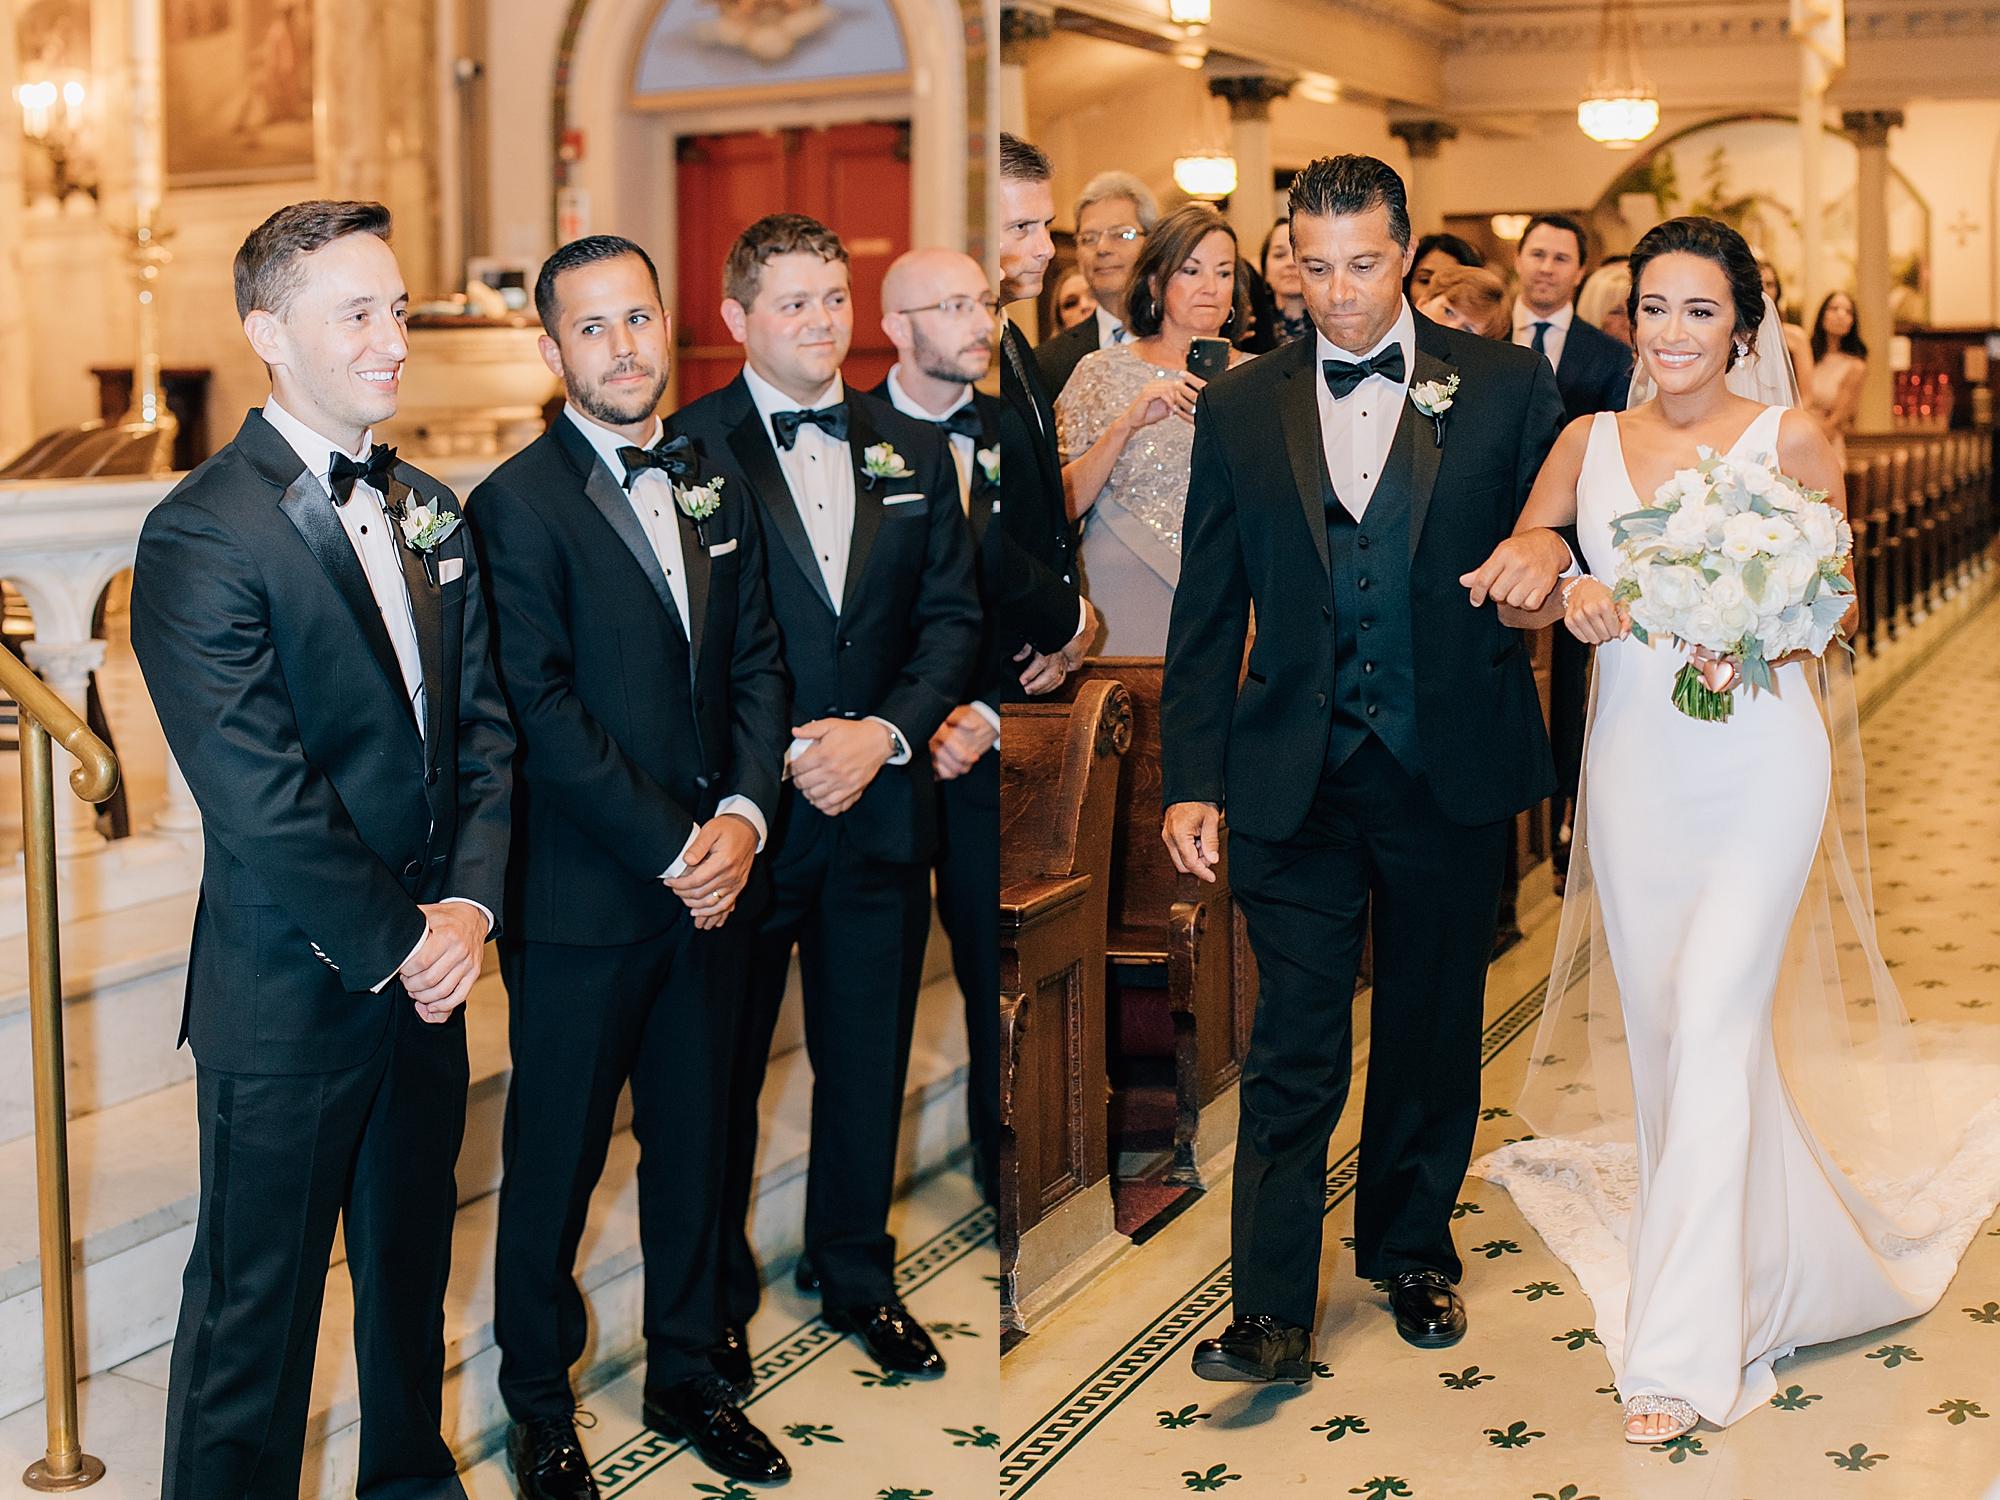 Cescaphe Philadelphia Film Wedding Photography by Magdalena Studios 17